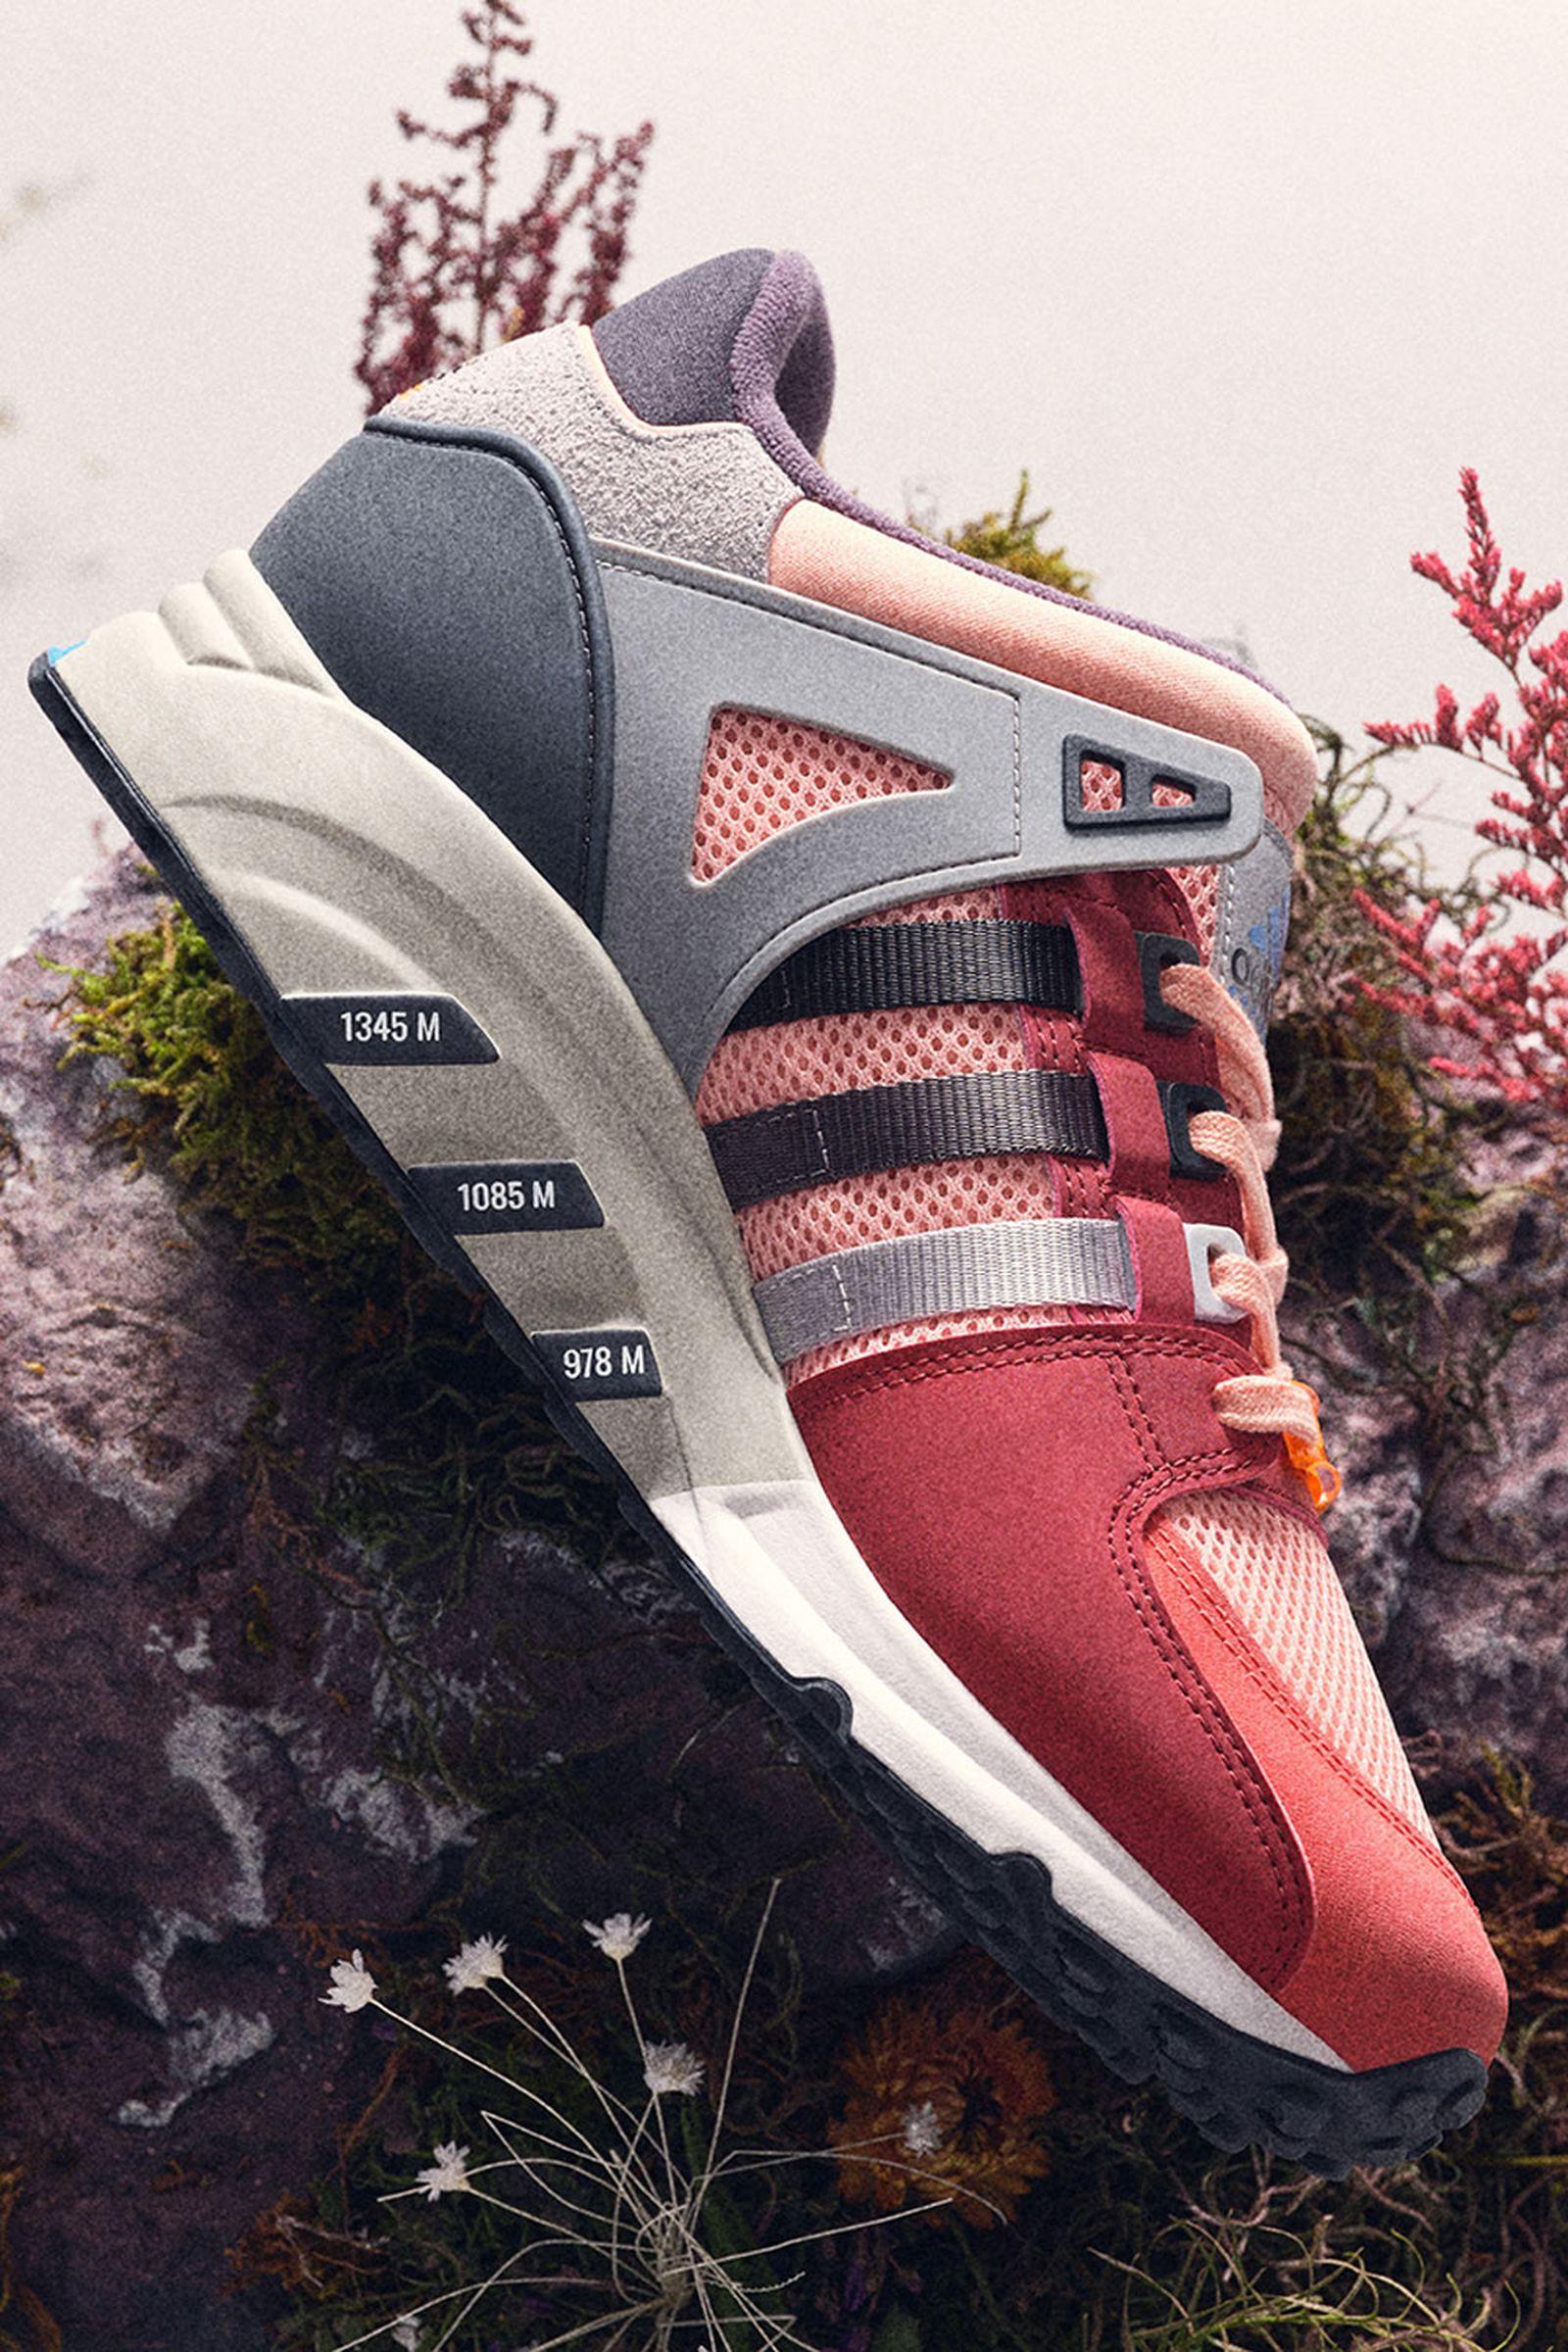 footpatrol-x-adidas-eqt-running-support-93-release-info-03